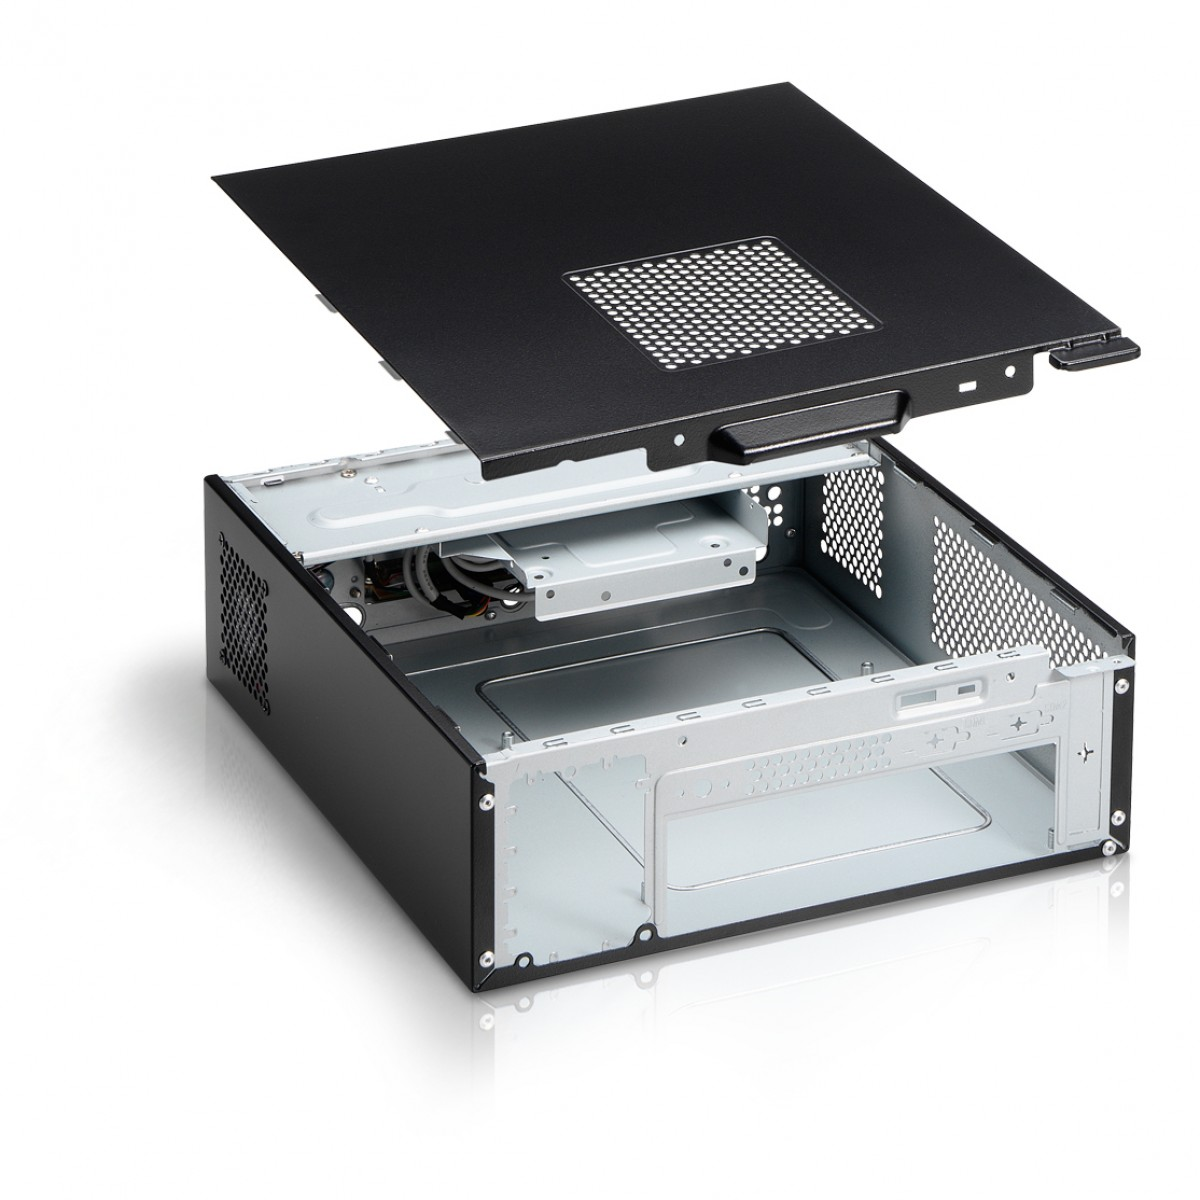 Computador NTC Compact T-Home Intel Celeron J4005 / 4GB DDR4 / SSD 120GB / Linux